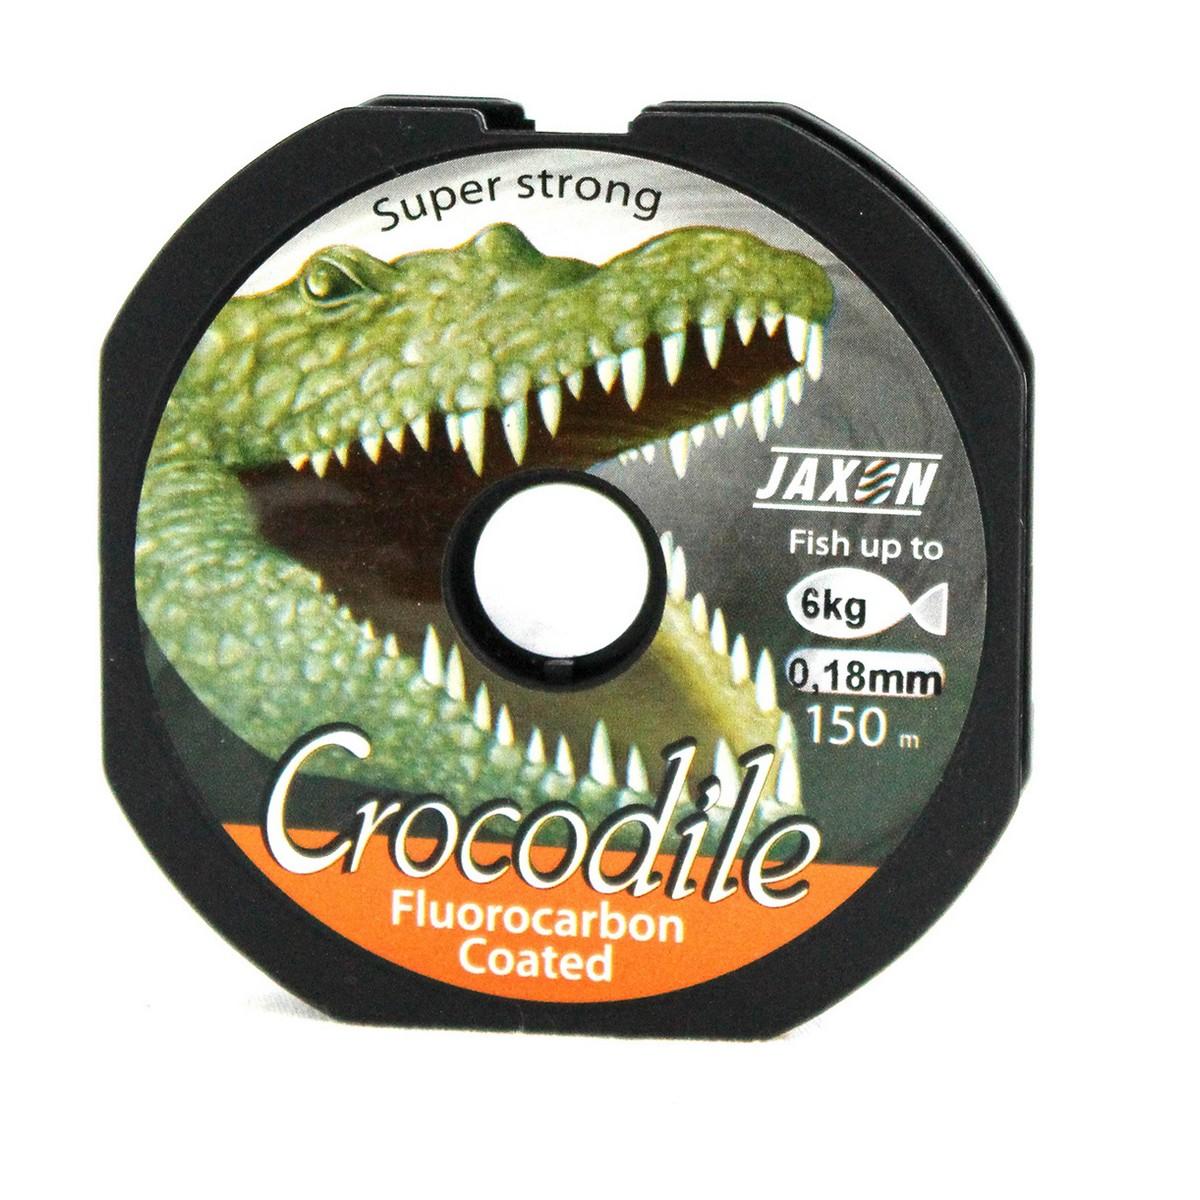 Jaxon Crocodile Fluorocarbon Coated 150m-0